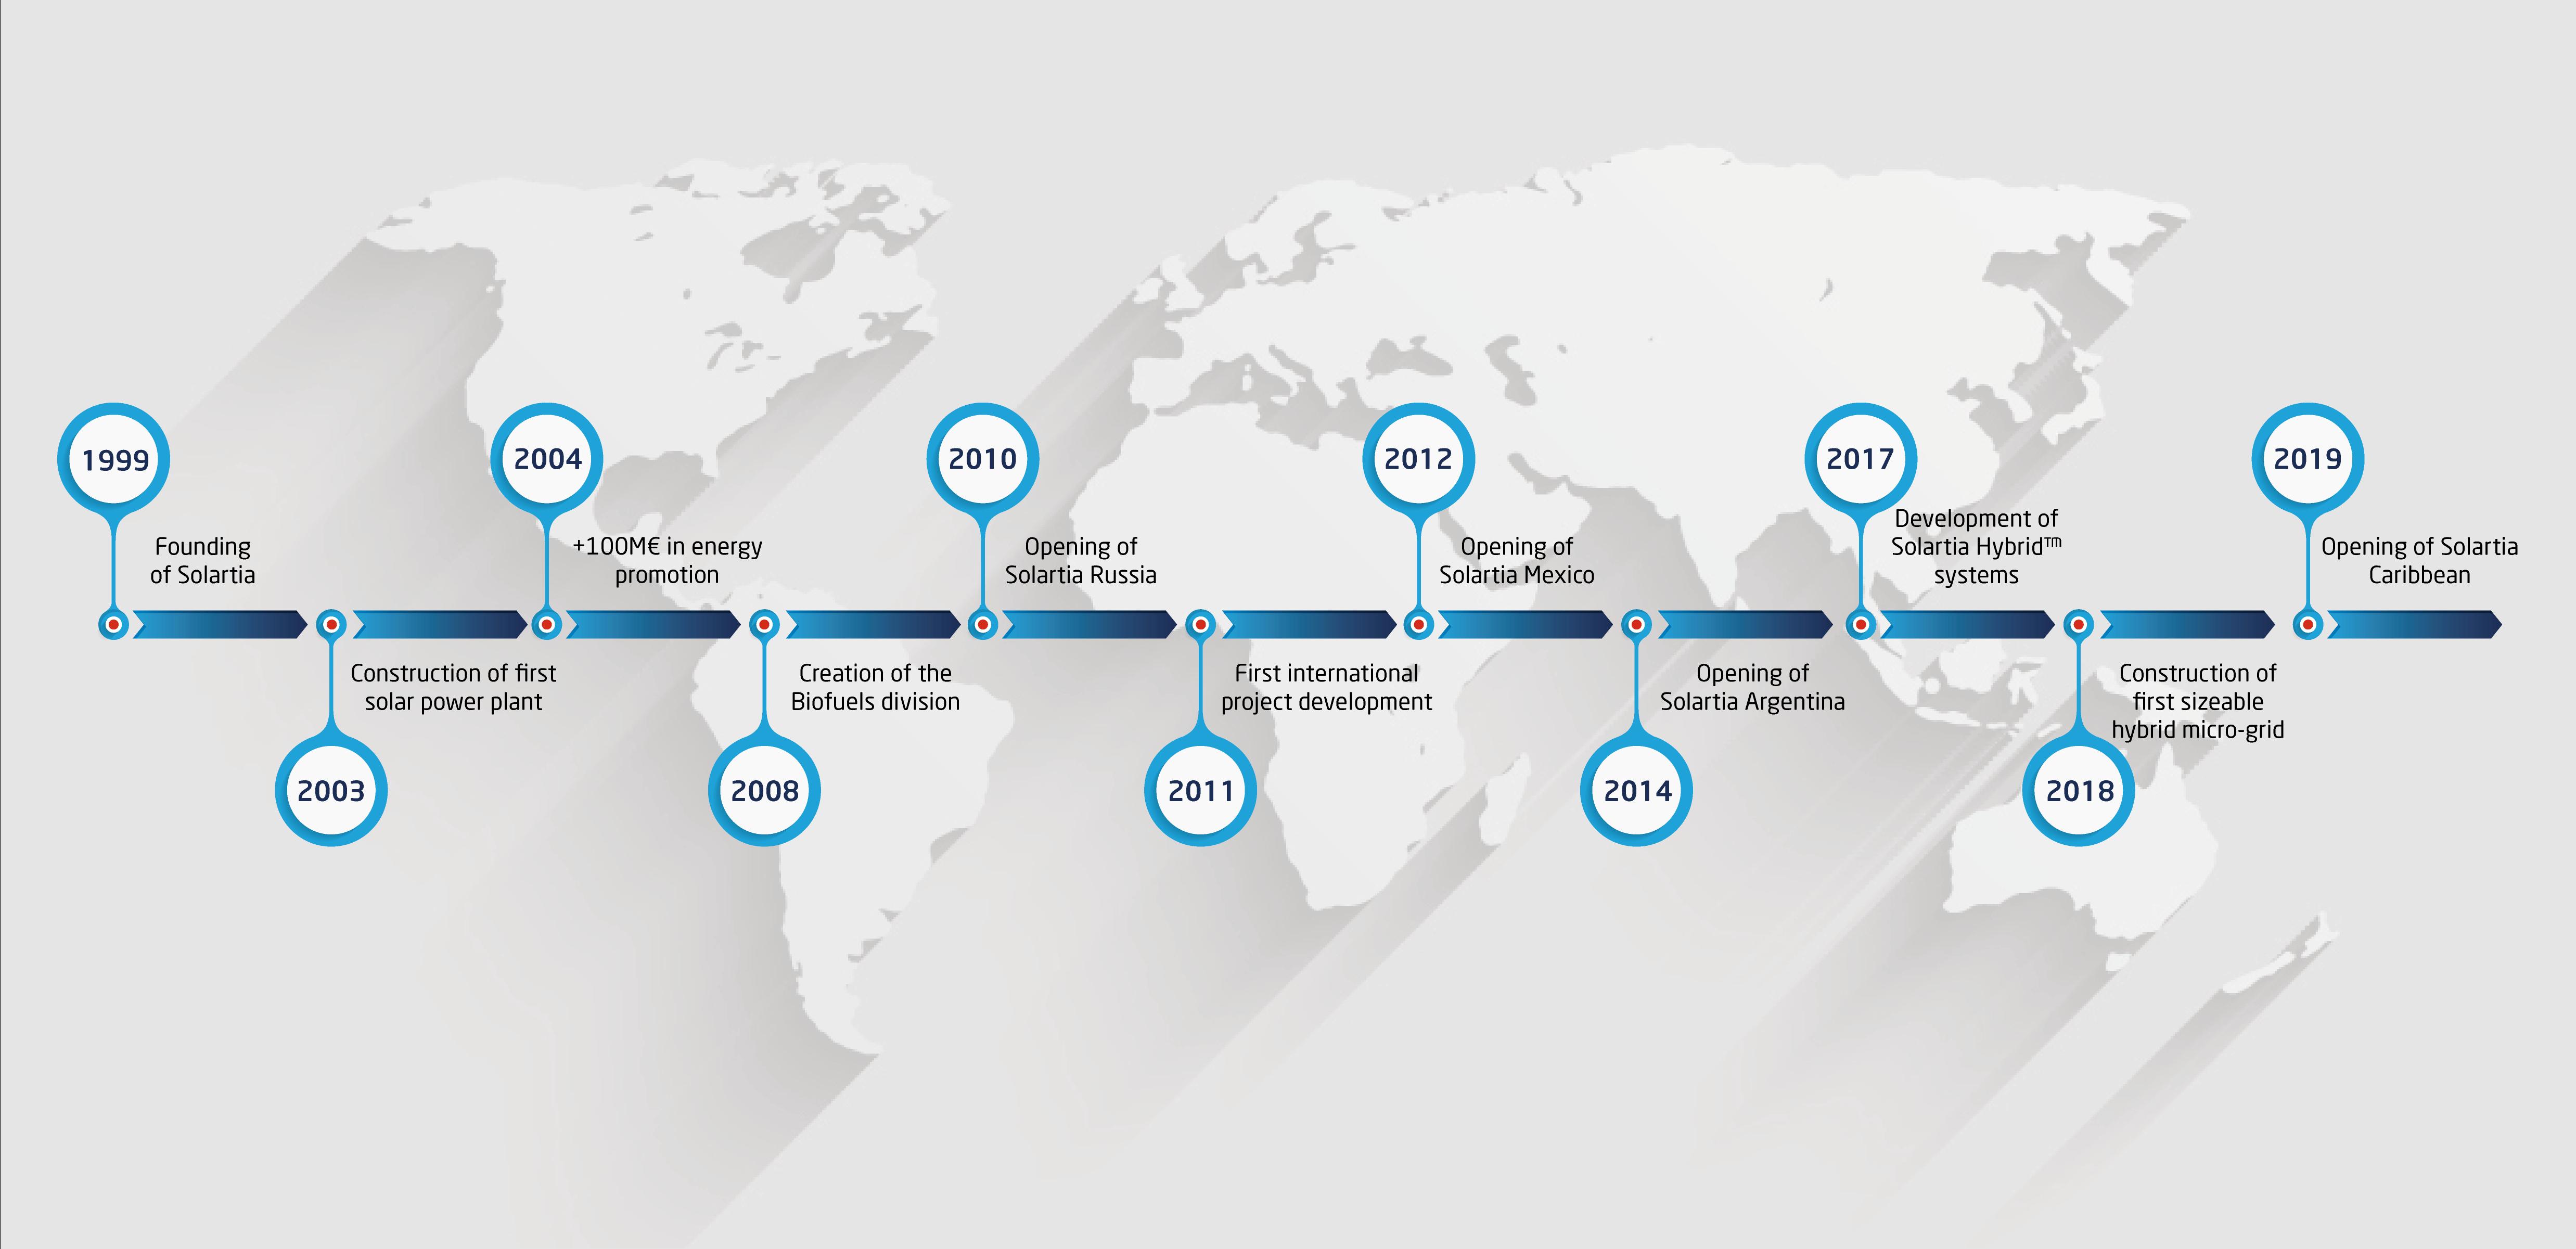 Solartia Timeline. History